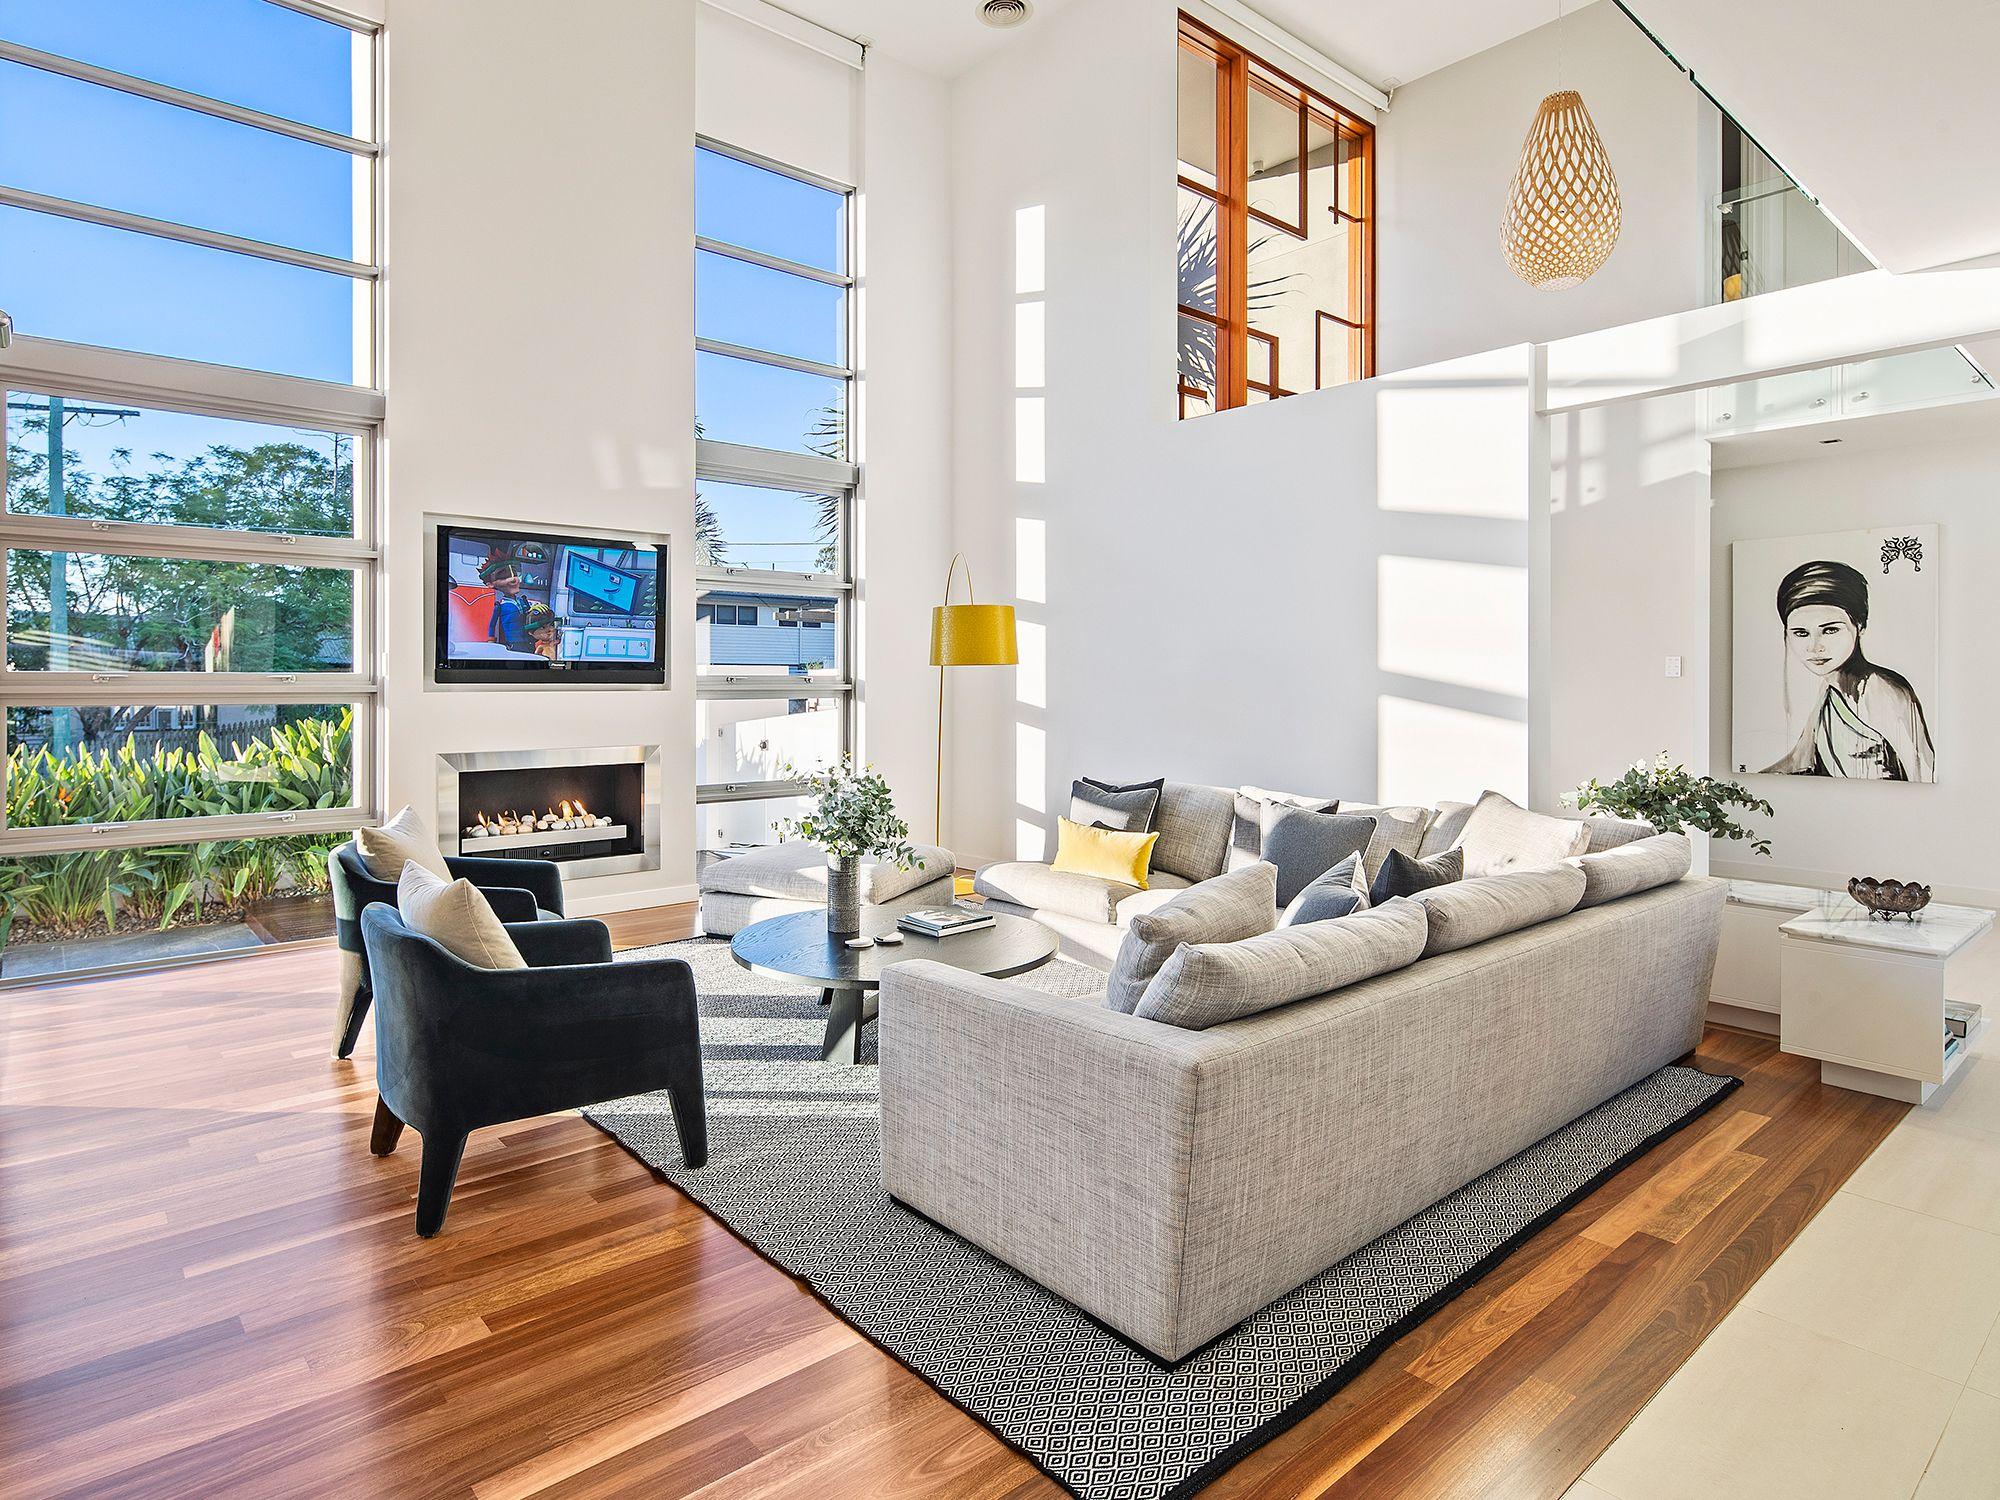 Home Ideas House Designs Photos And Decorating Ideas Realestate Com Au In 2020 Home Interior Design Modern Houses Interior Living Room Designs